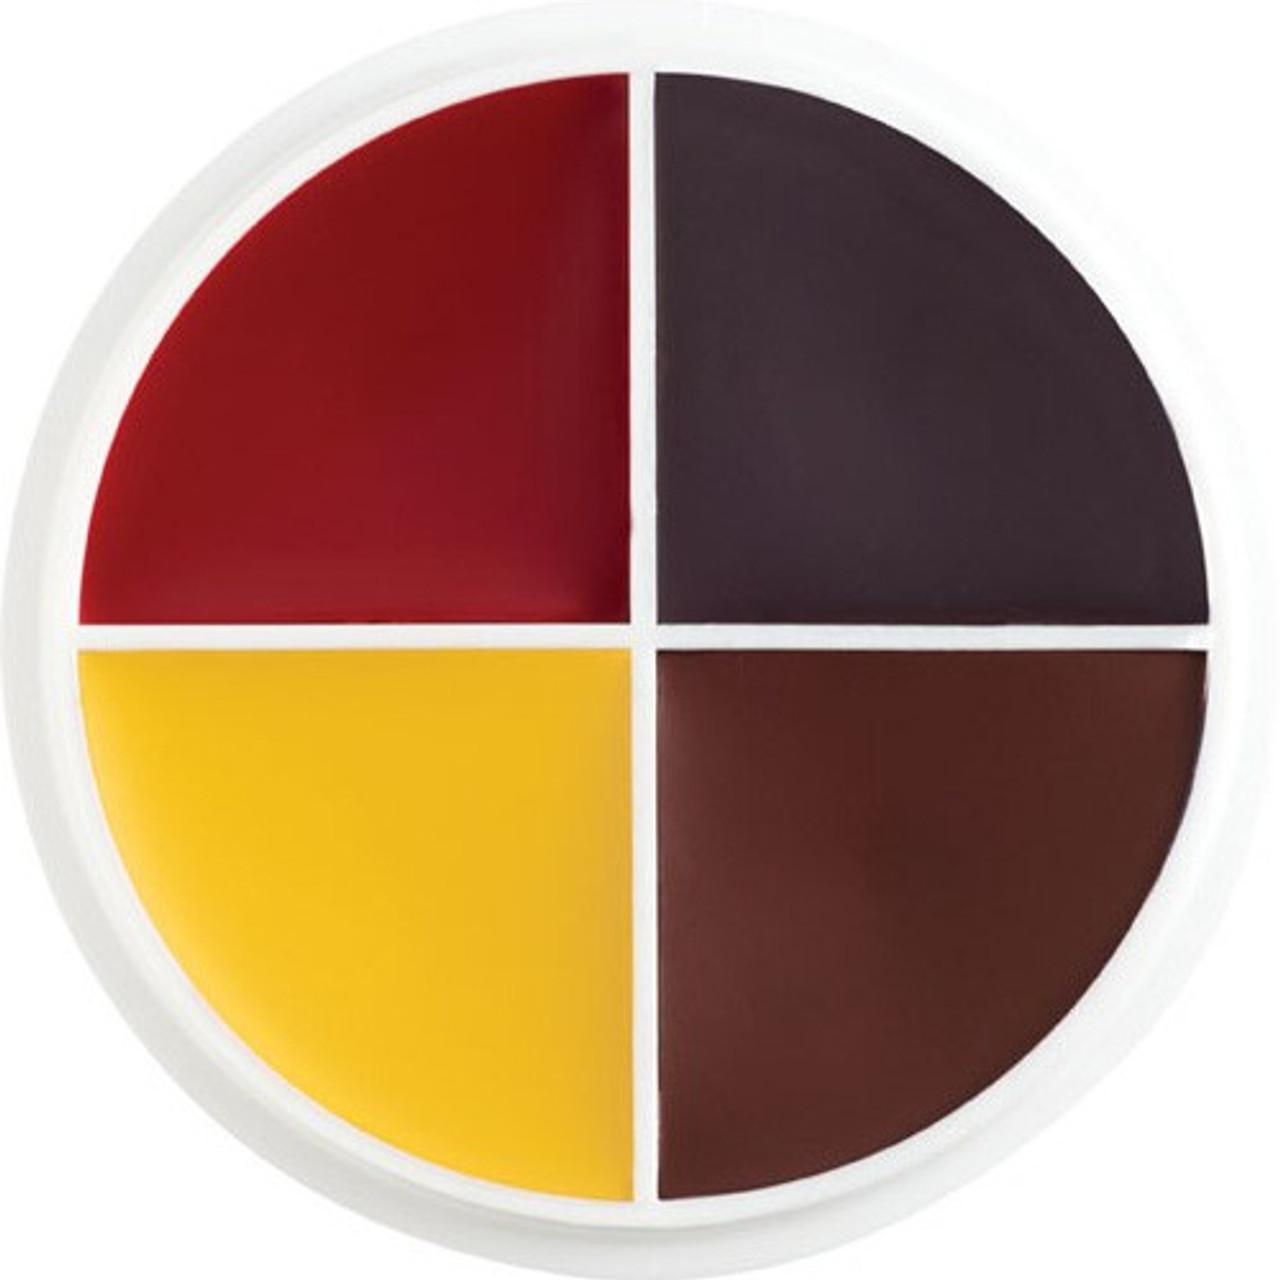 Ben Nye Bruise Abrasions F X Color Wheel 0 5 Oz